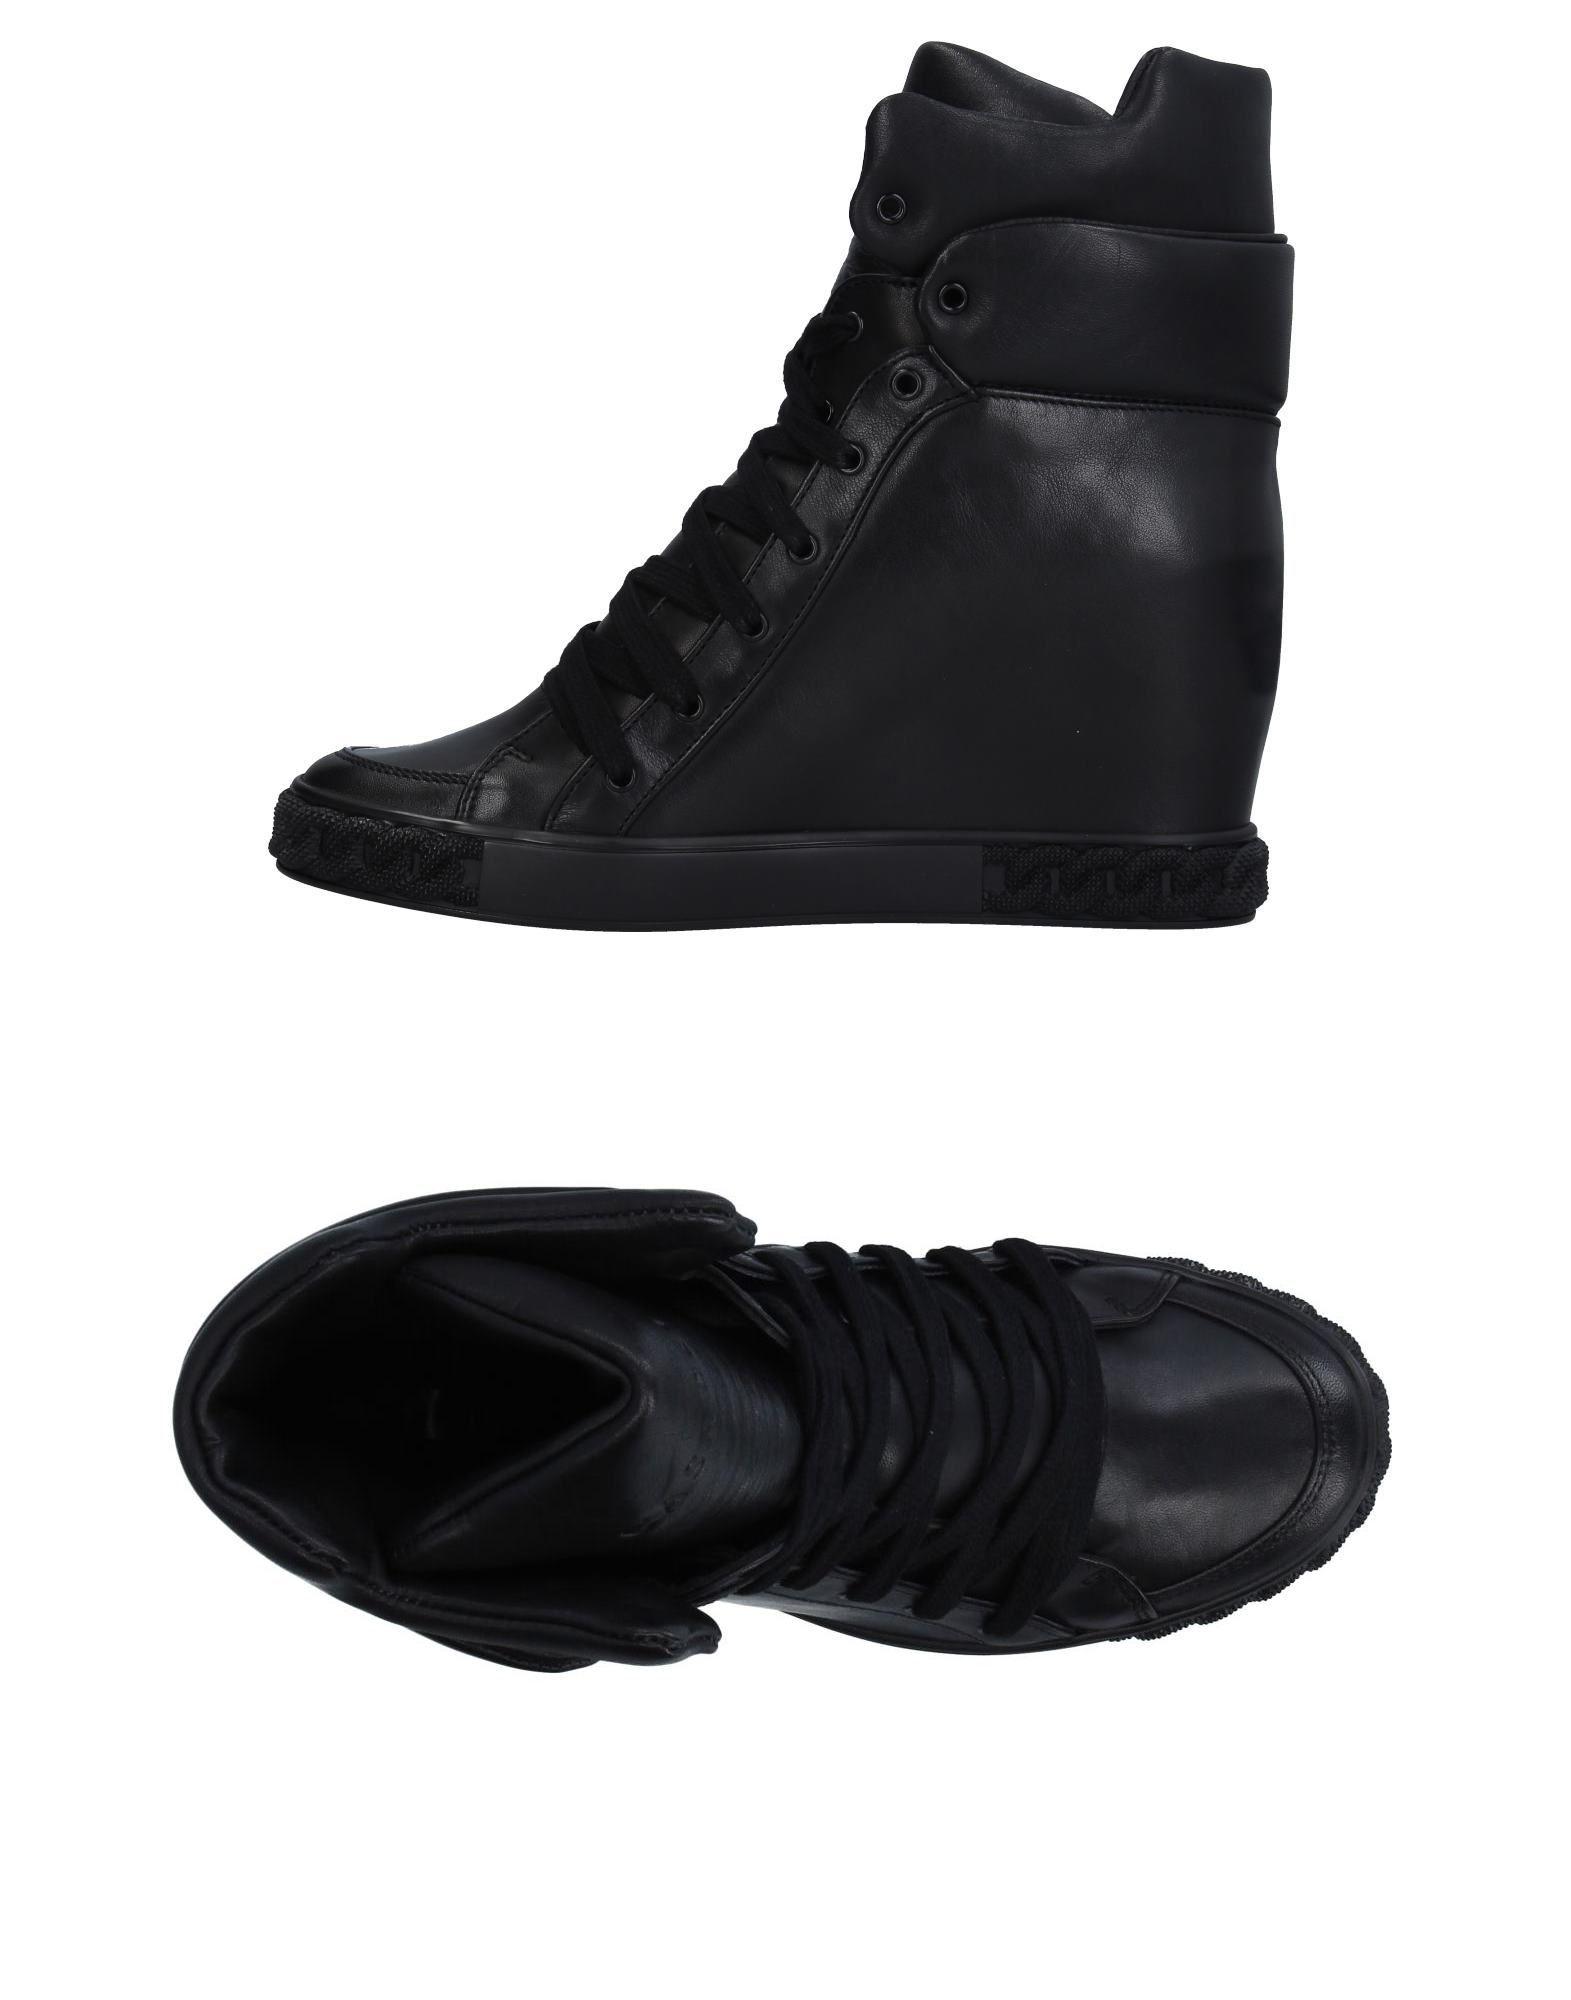 Moda 11321395VU Sneakers Casadei Donna - 11321395VU Moda 64d43f